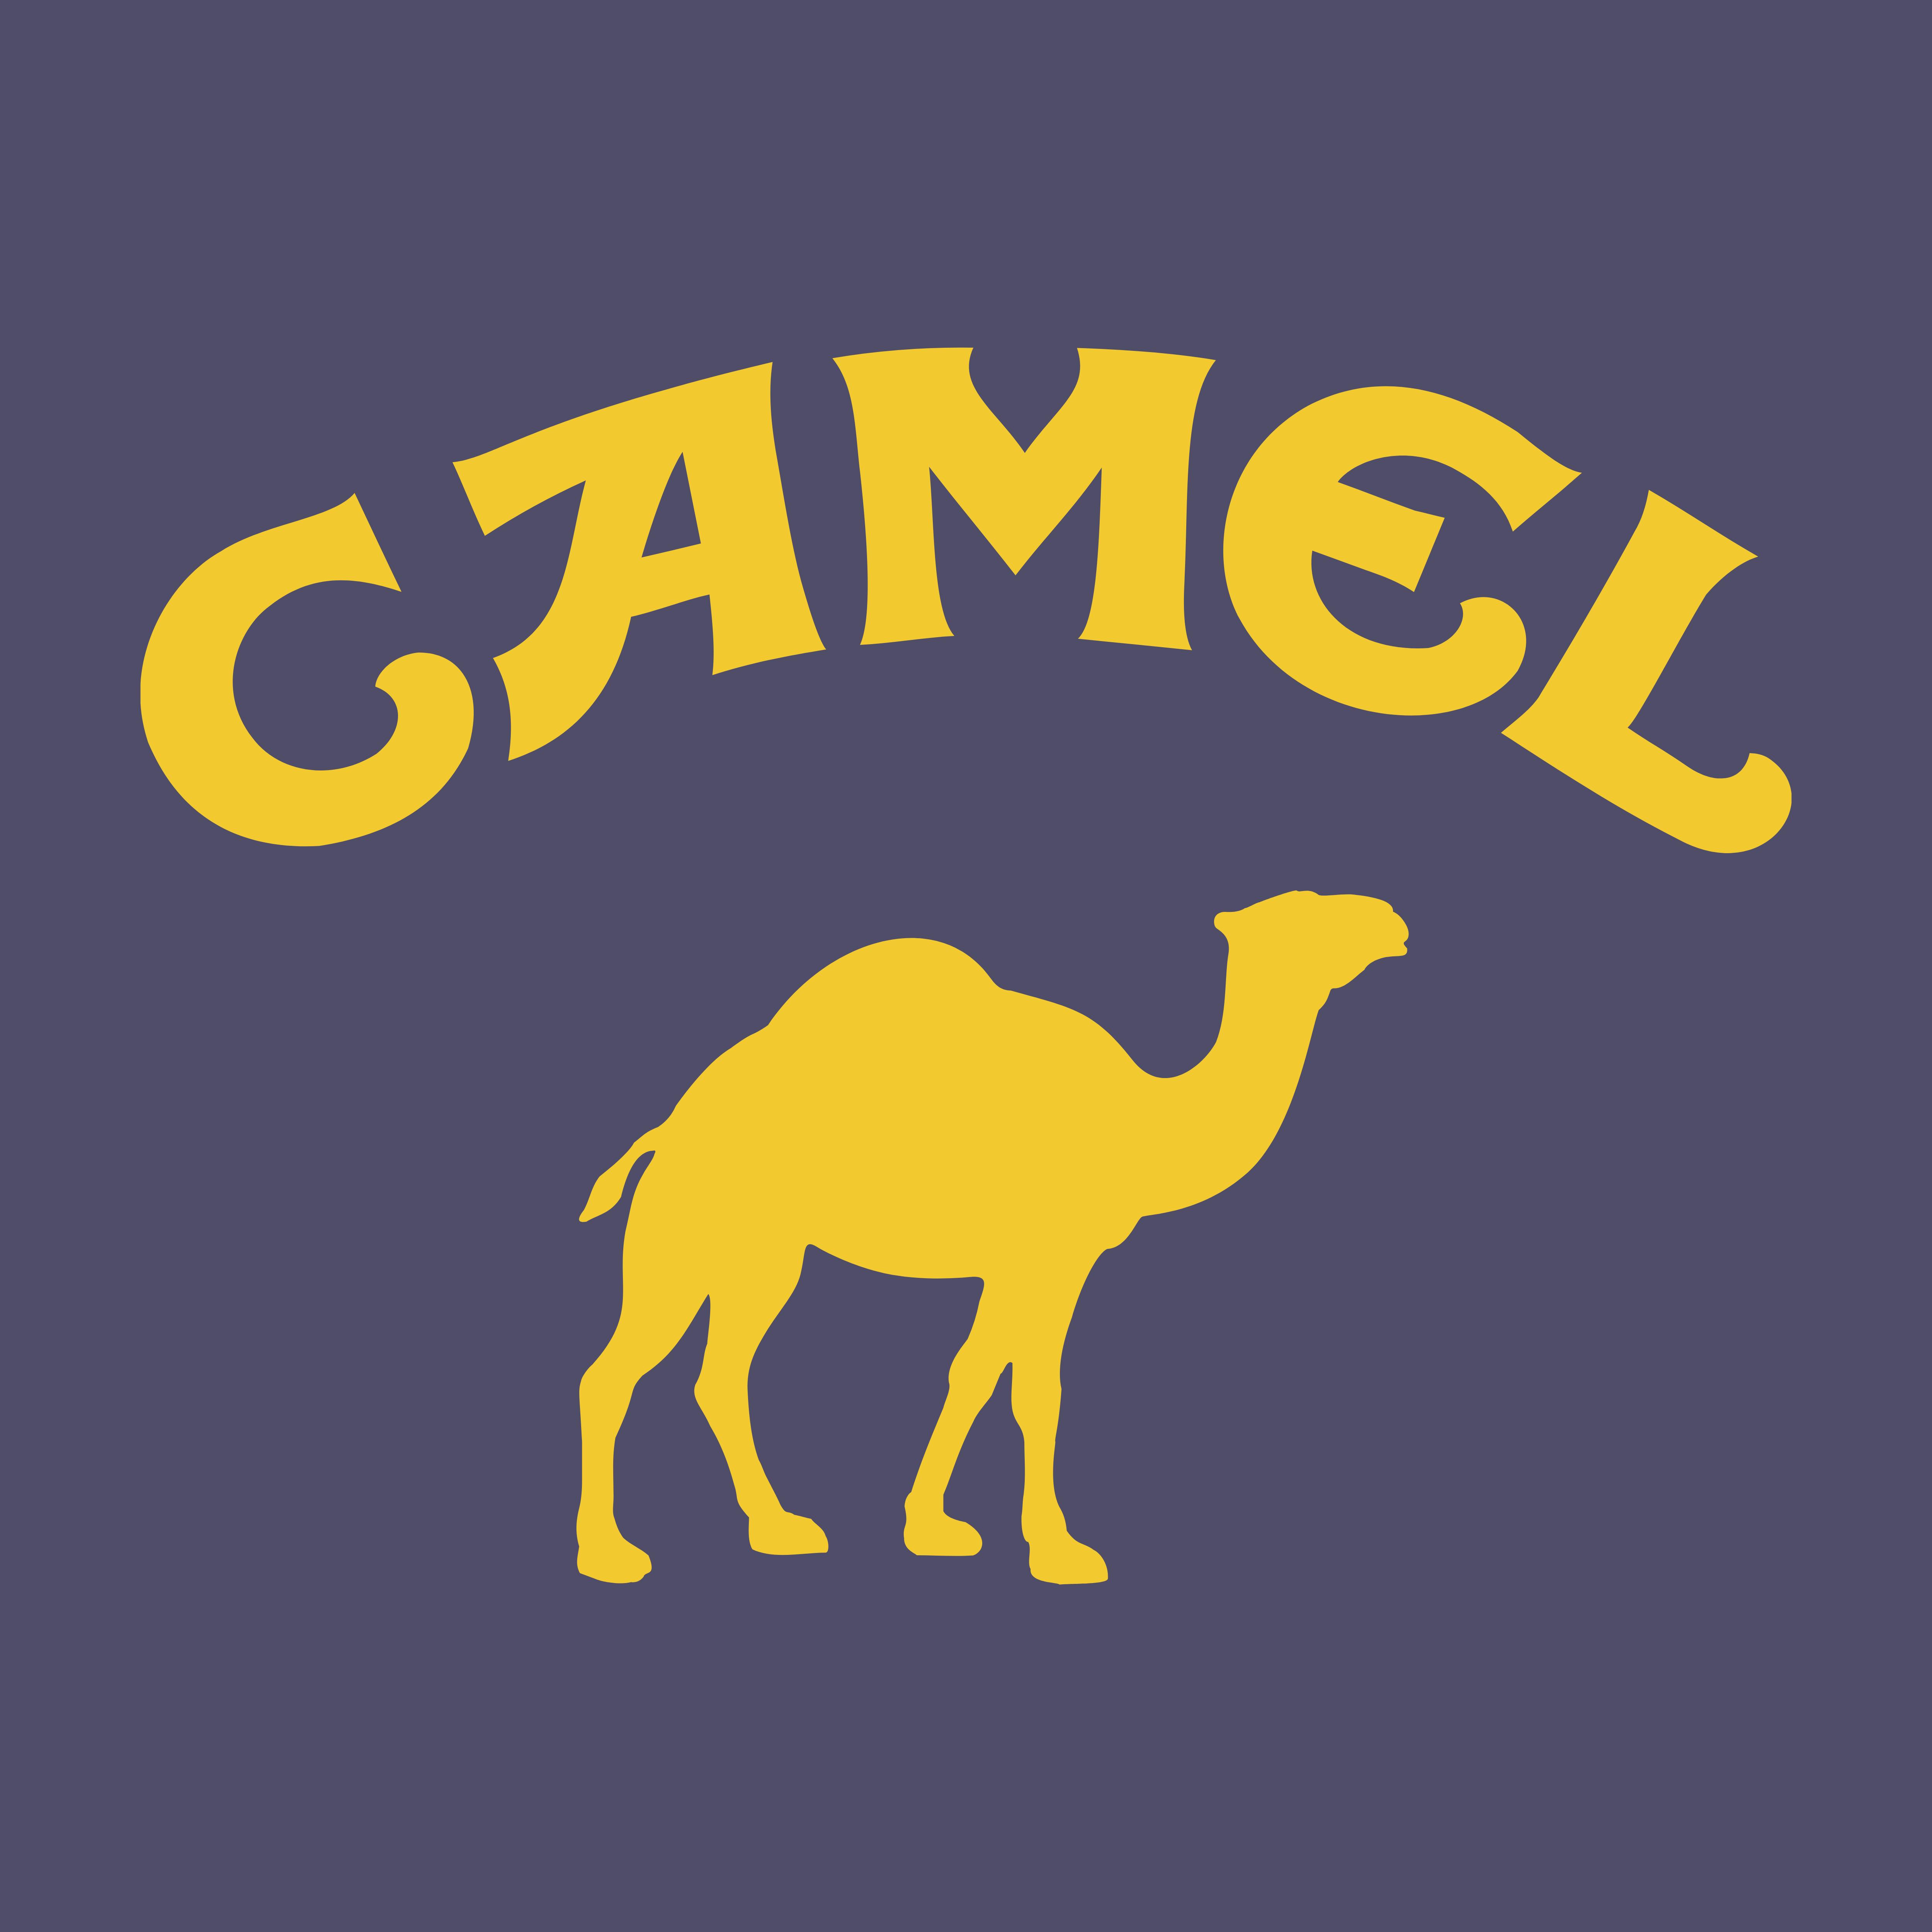 Camel – Logos Download  Camel Cigarettes Logo Wallpaper